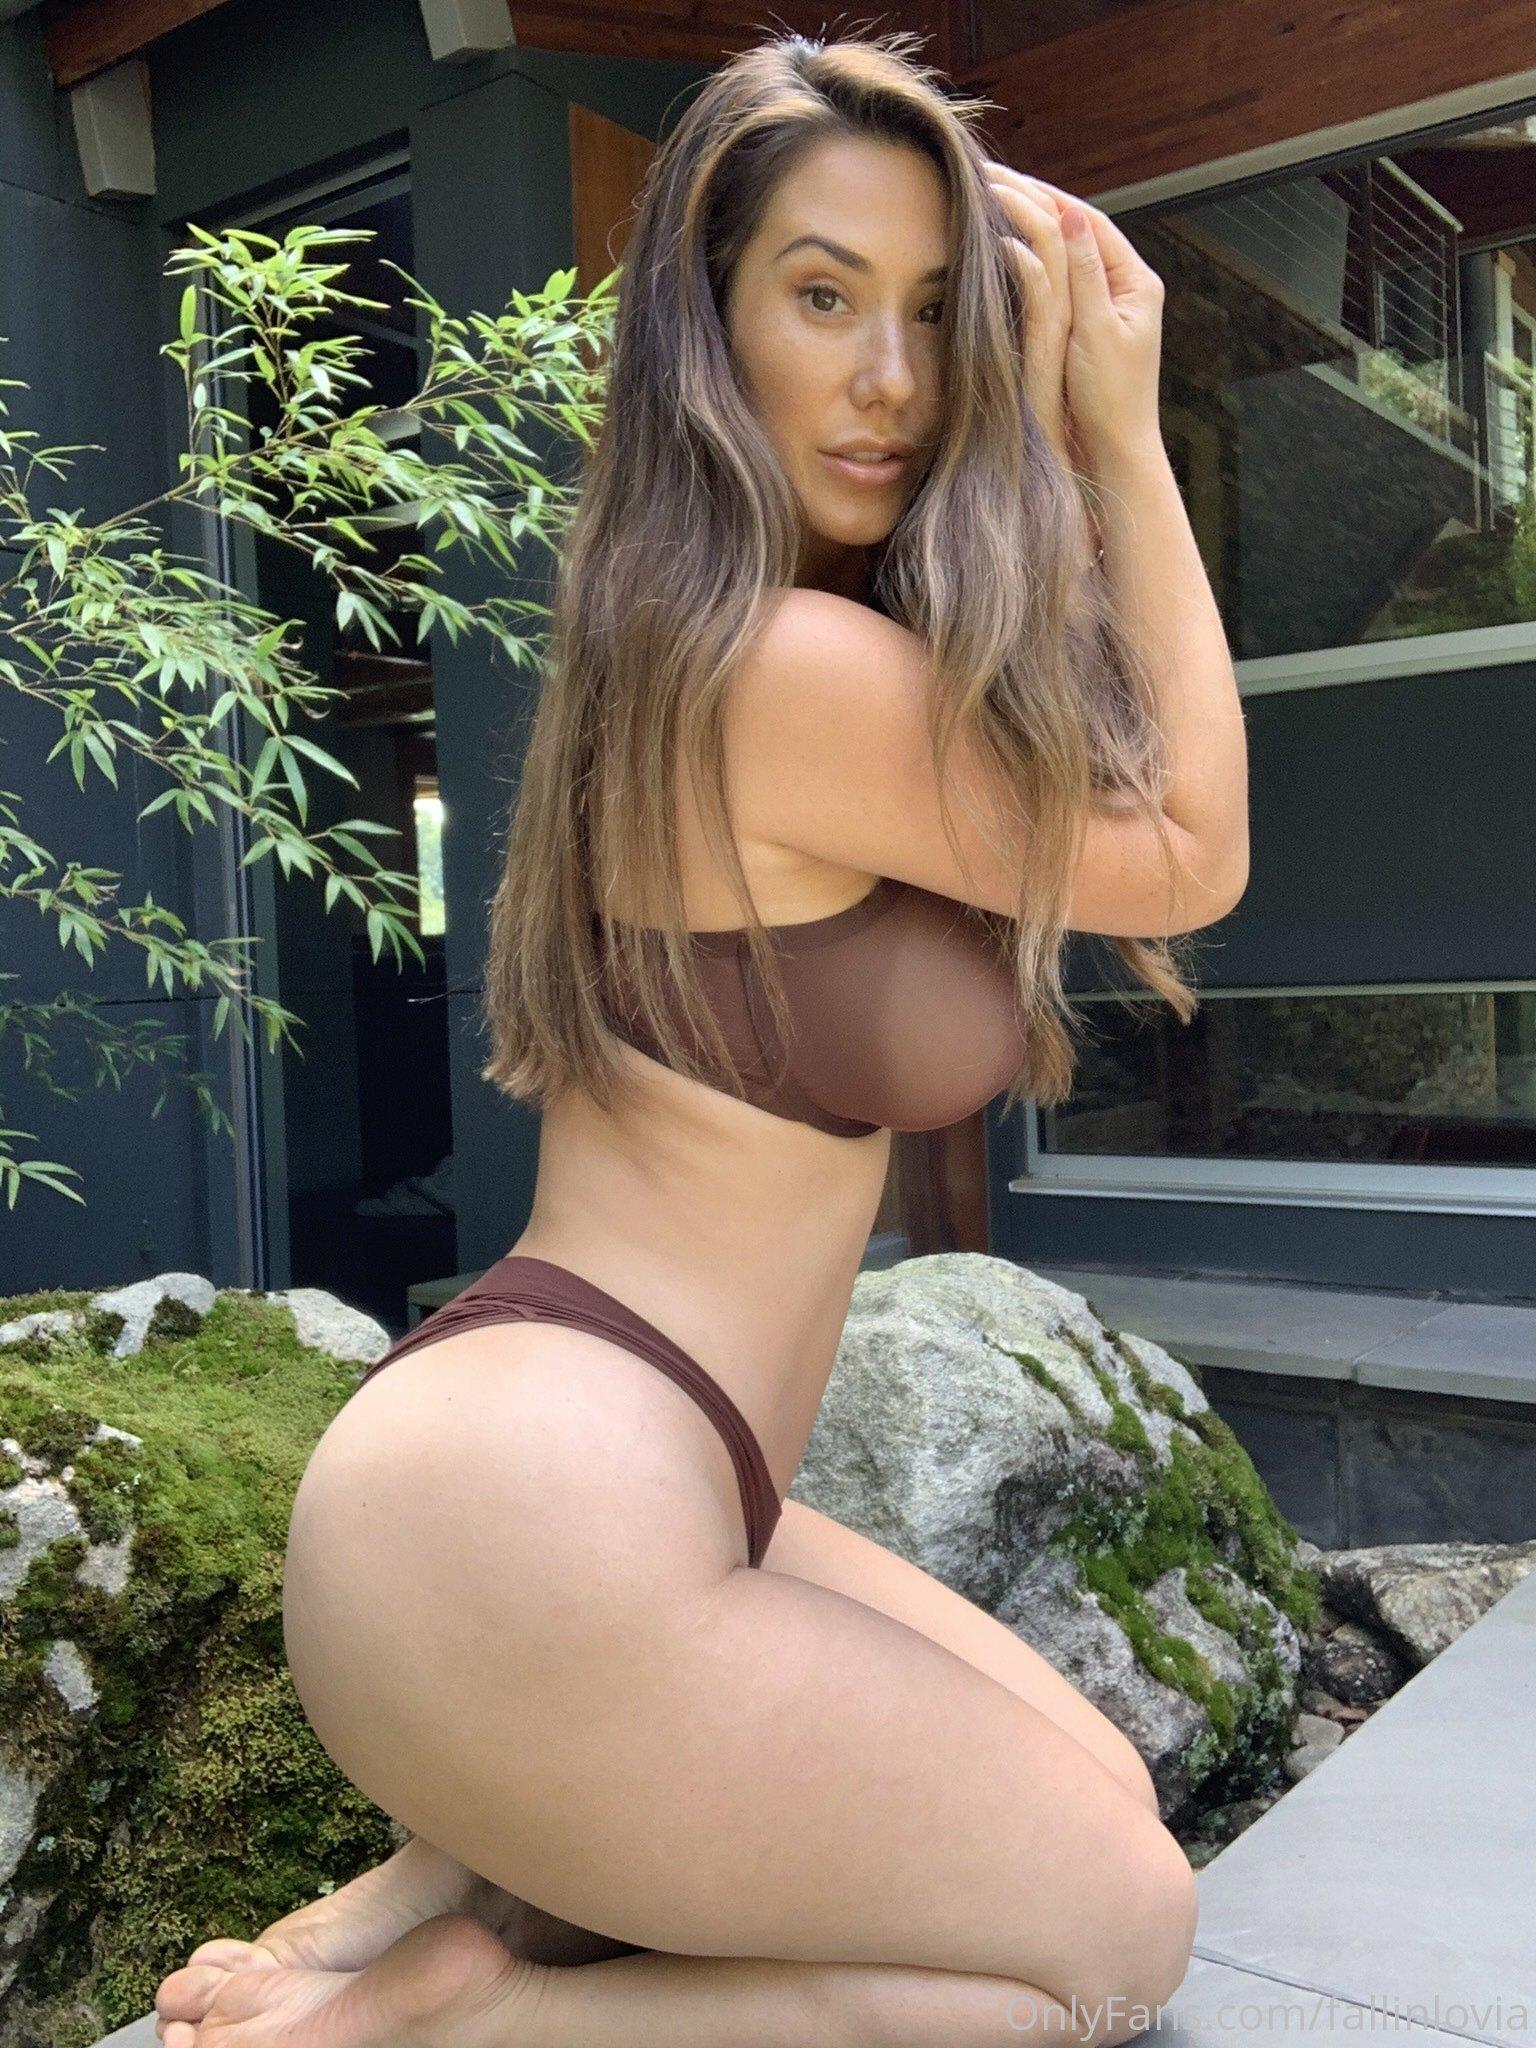 Eva Lovia, Fallinlovia, Onlyfans 0258